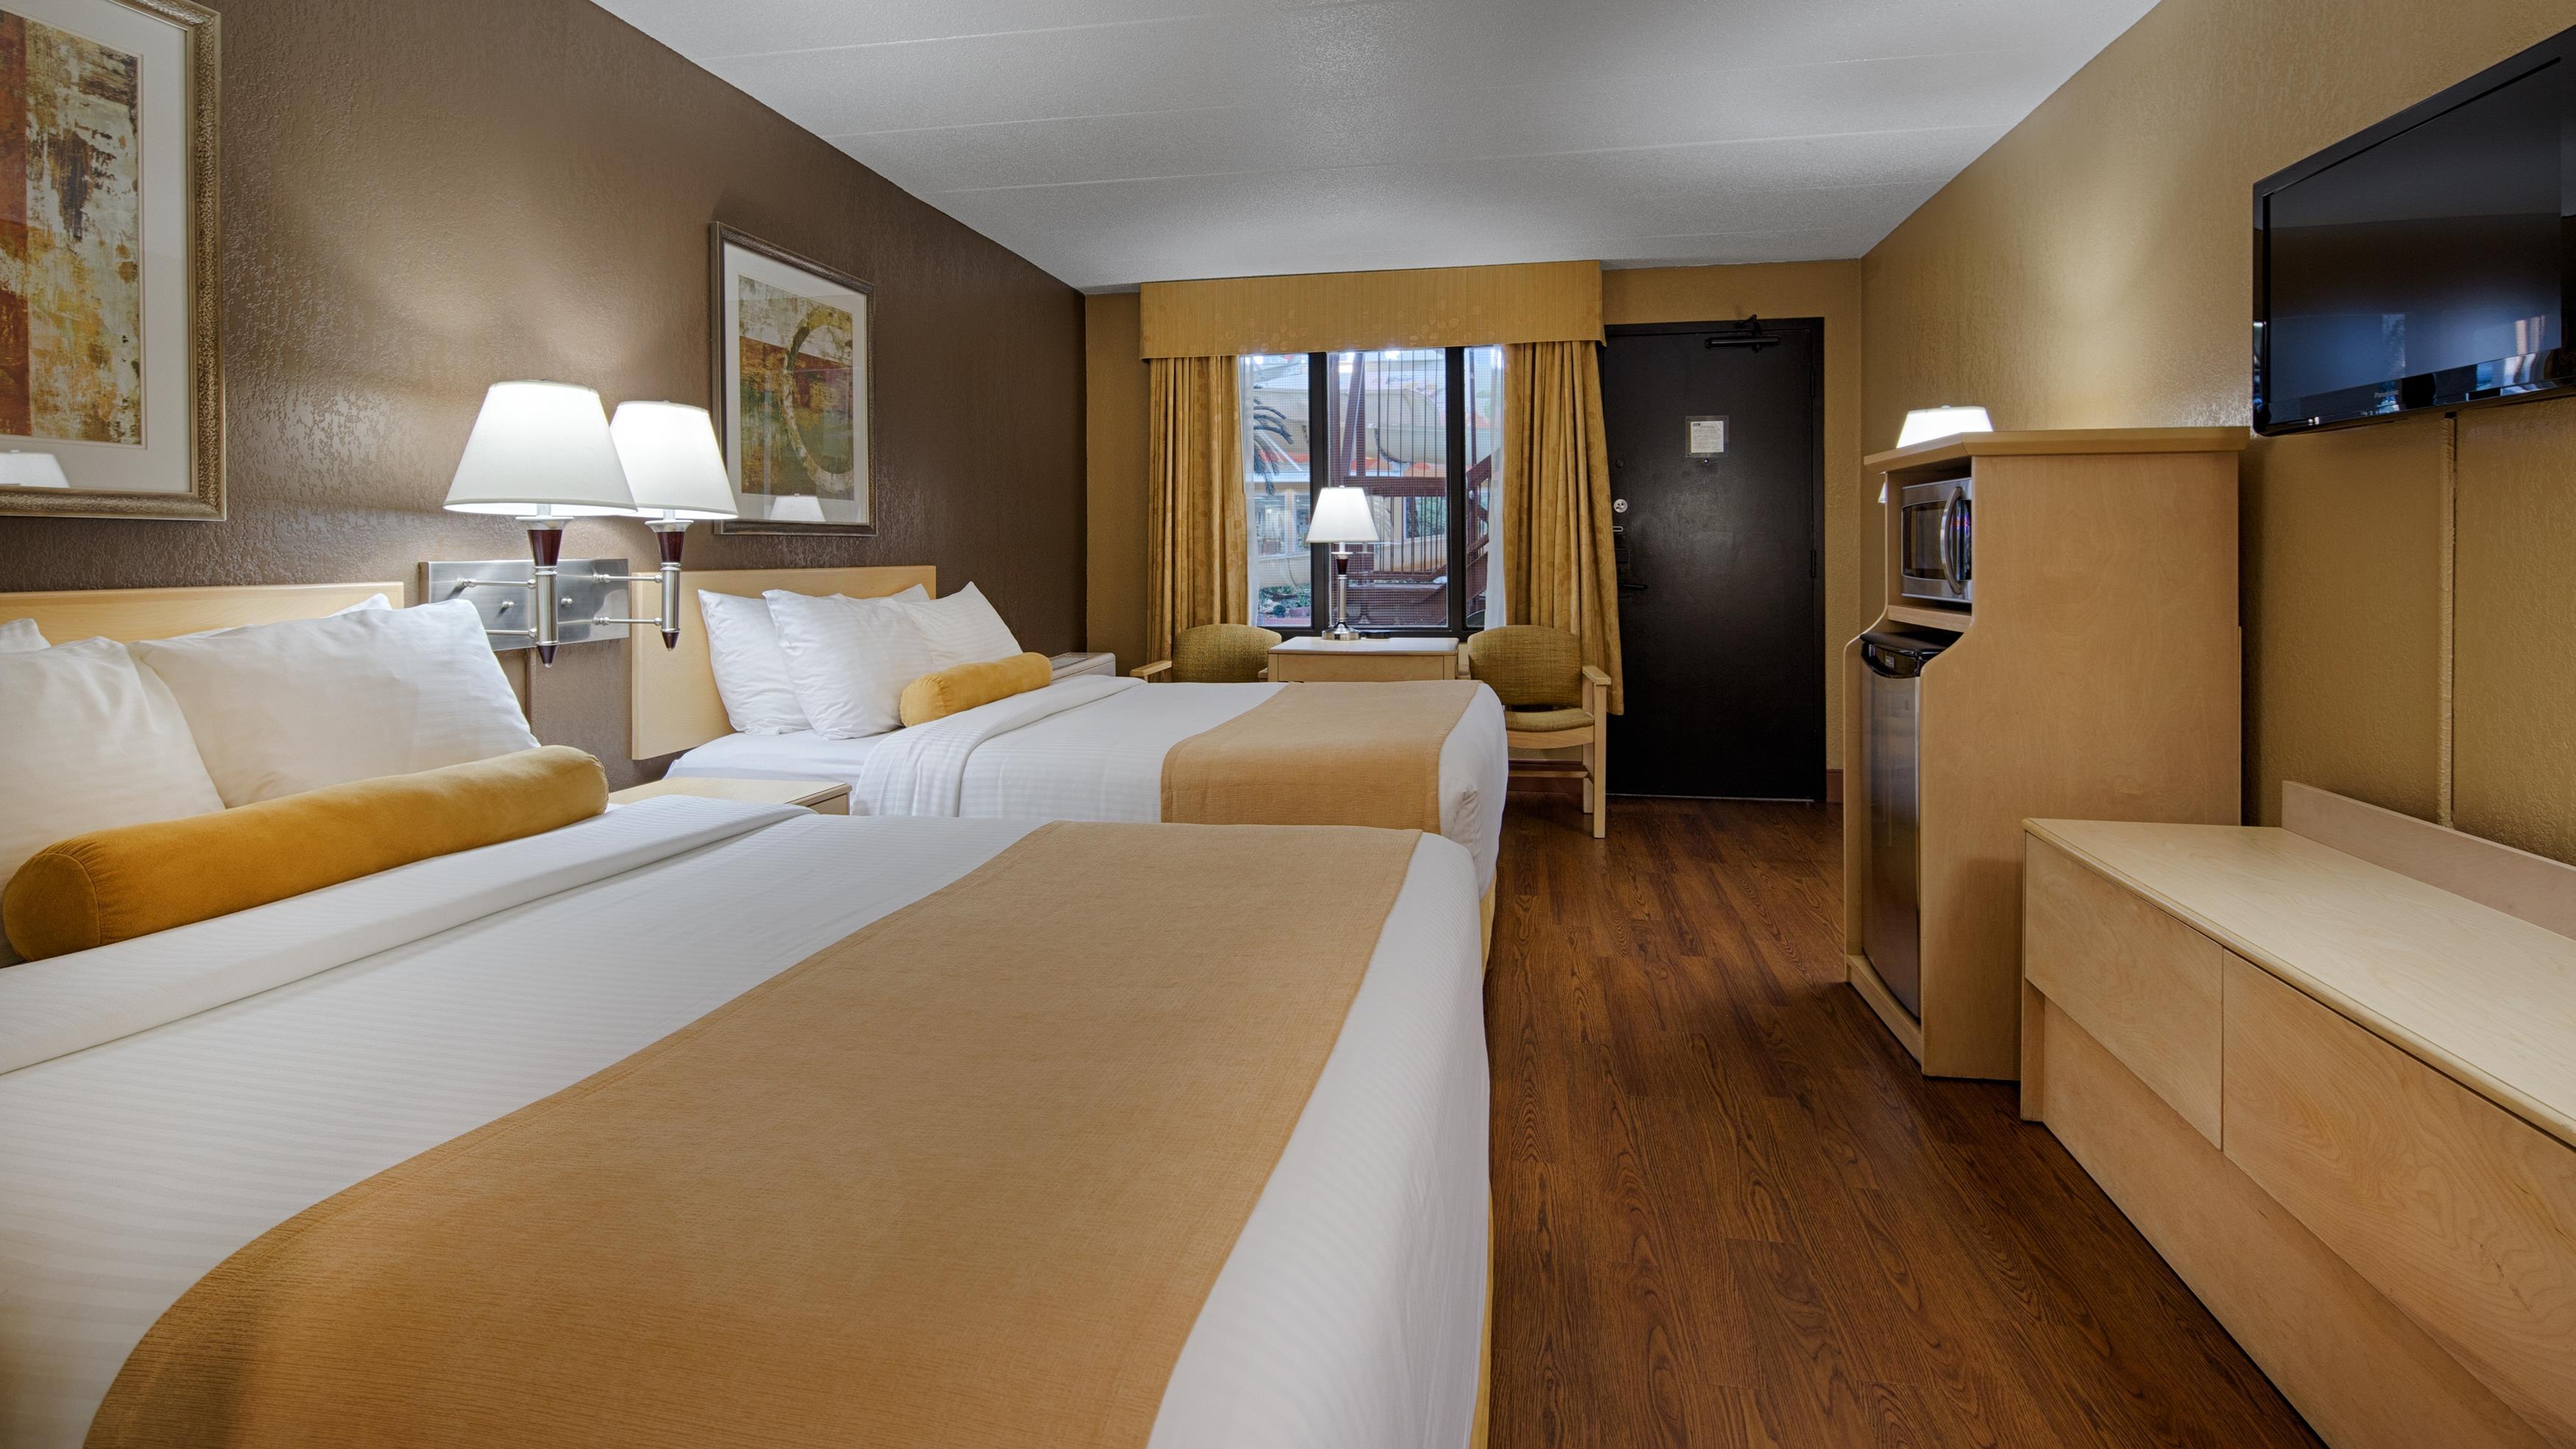 Best Western Seven Oaks Inn in Regina: Two Queen Bed Guest Room